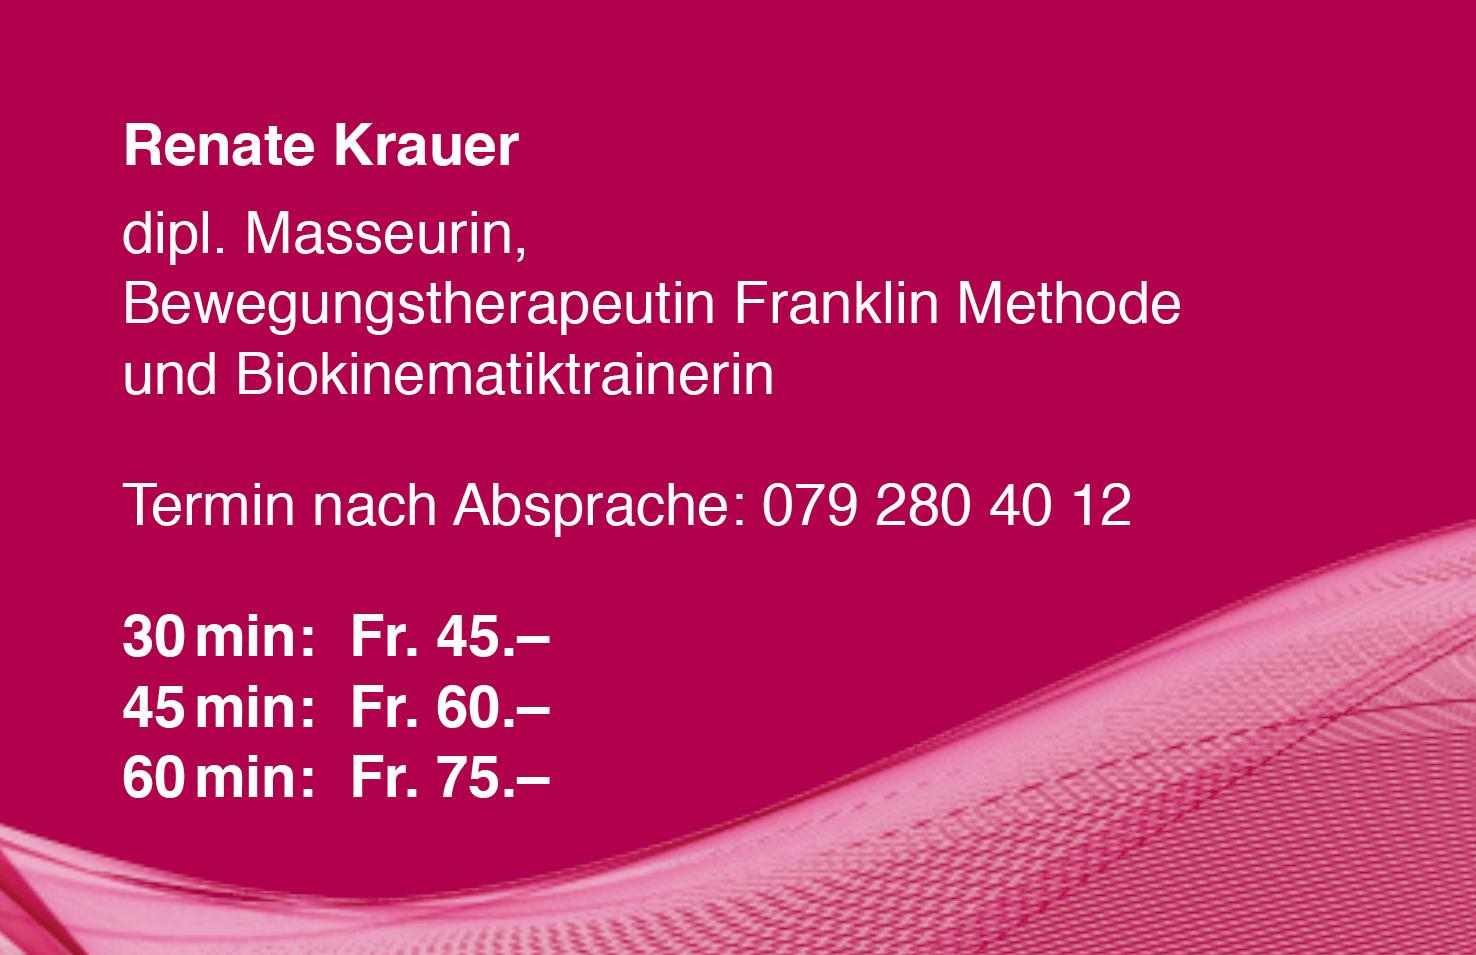 Preisliste Renate Krauer